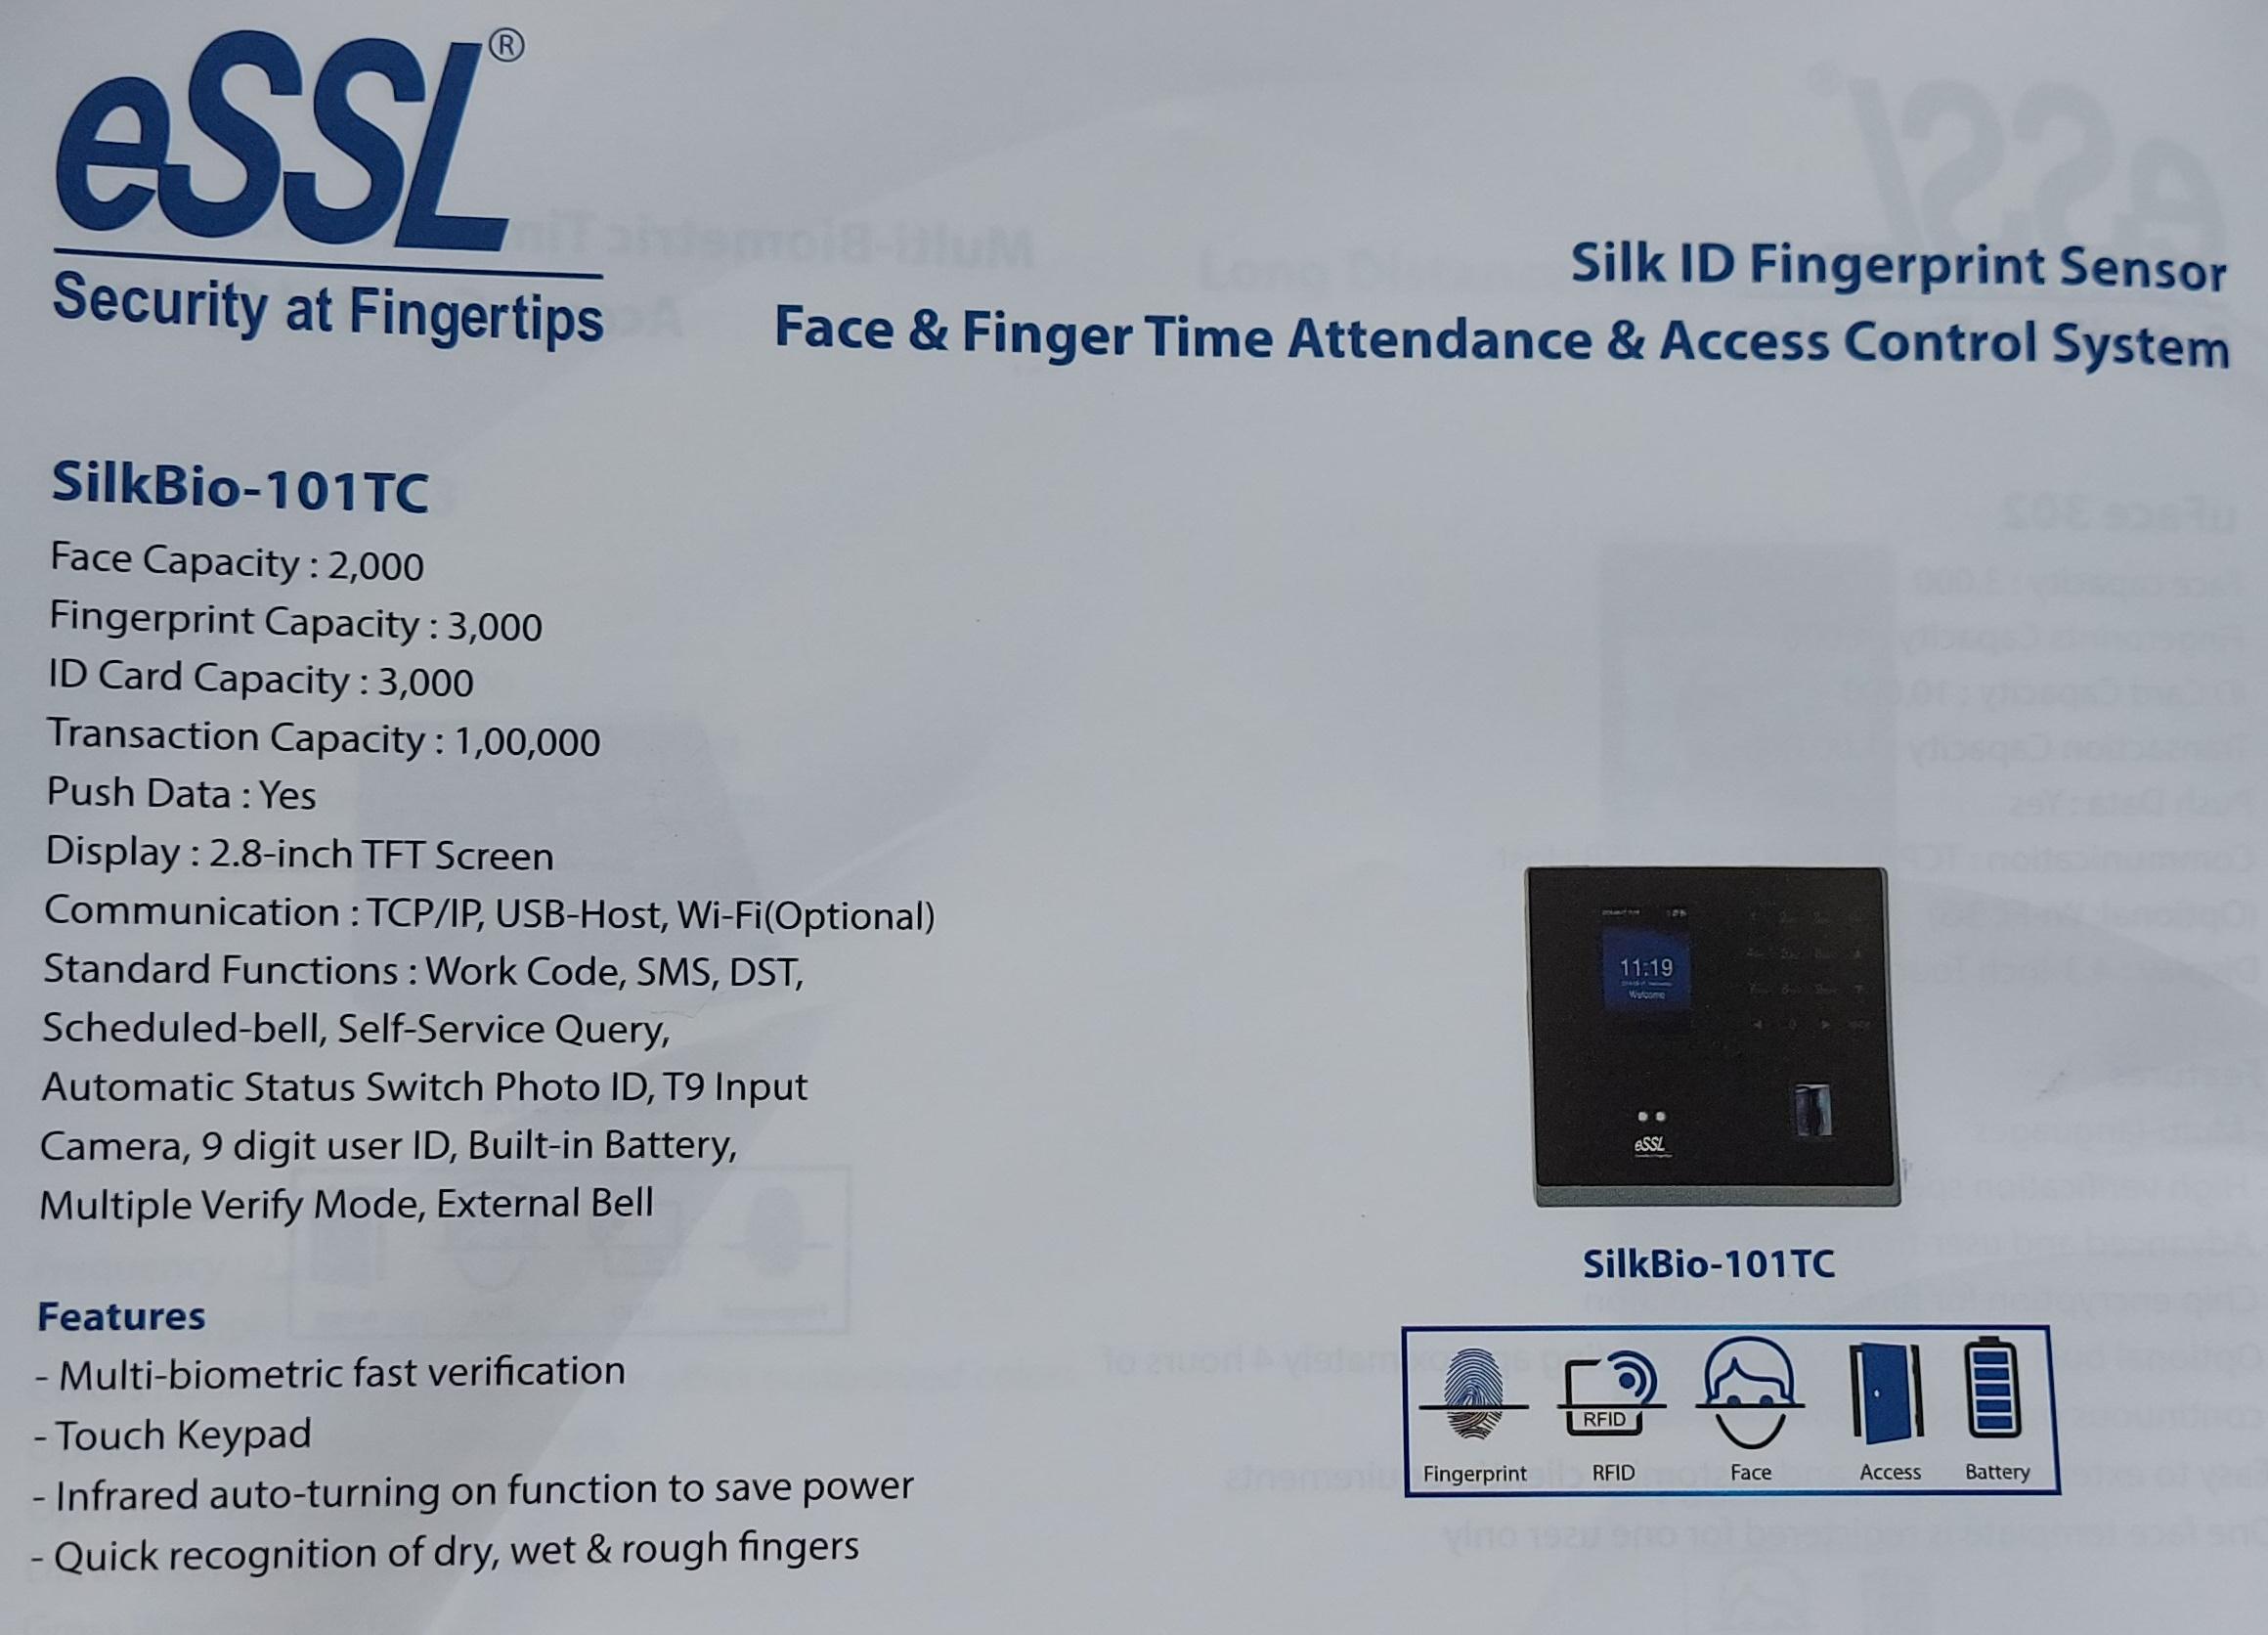 face & finger attendance system